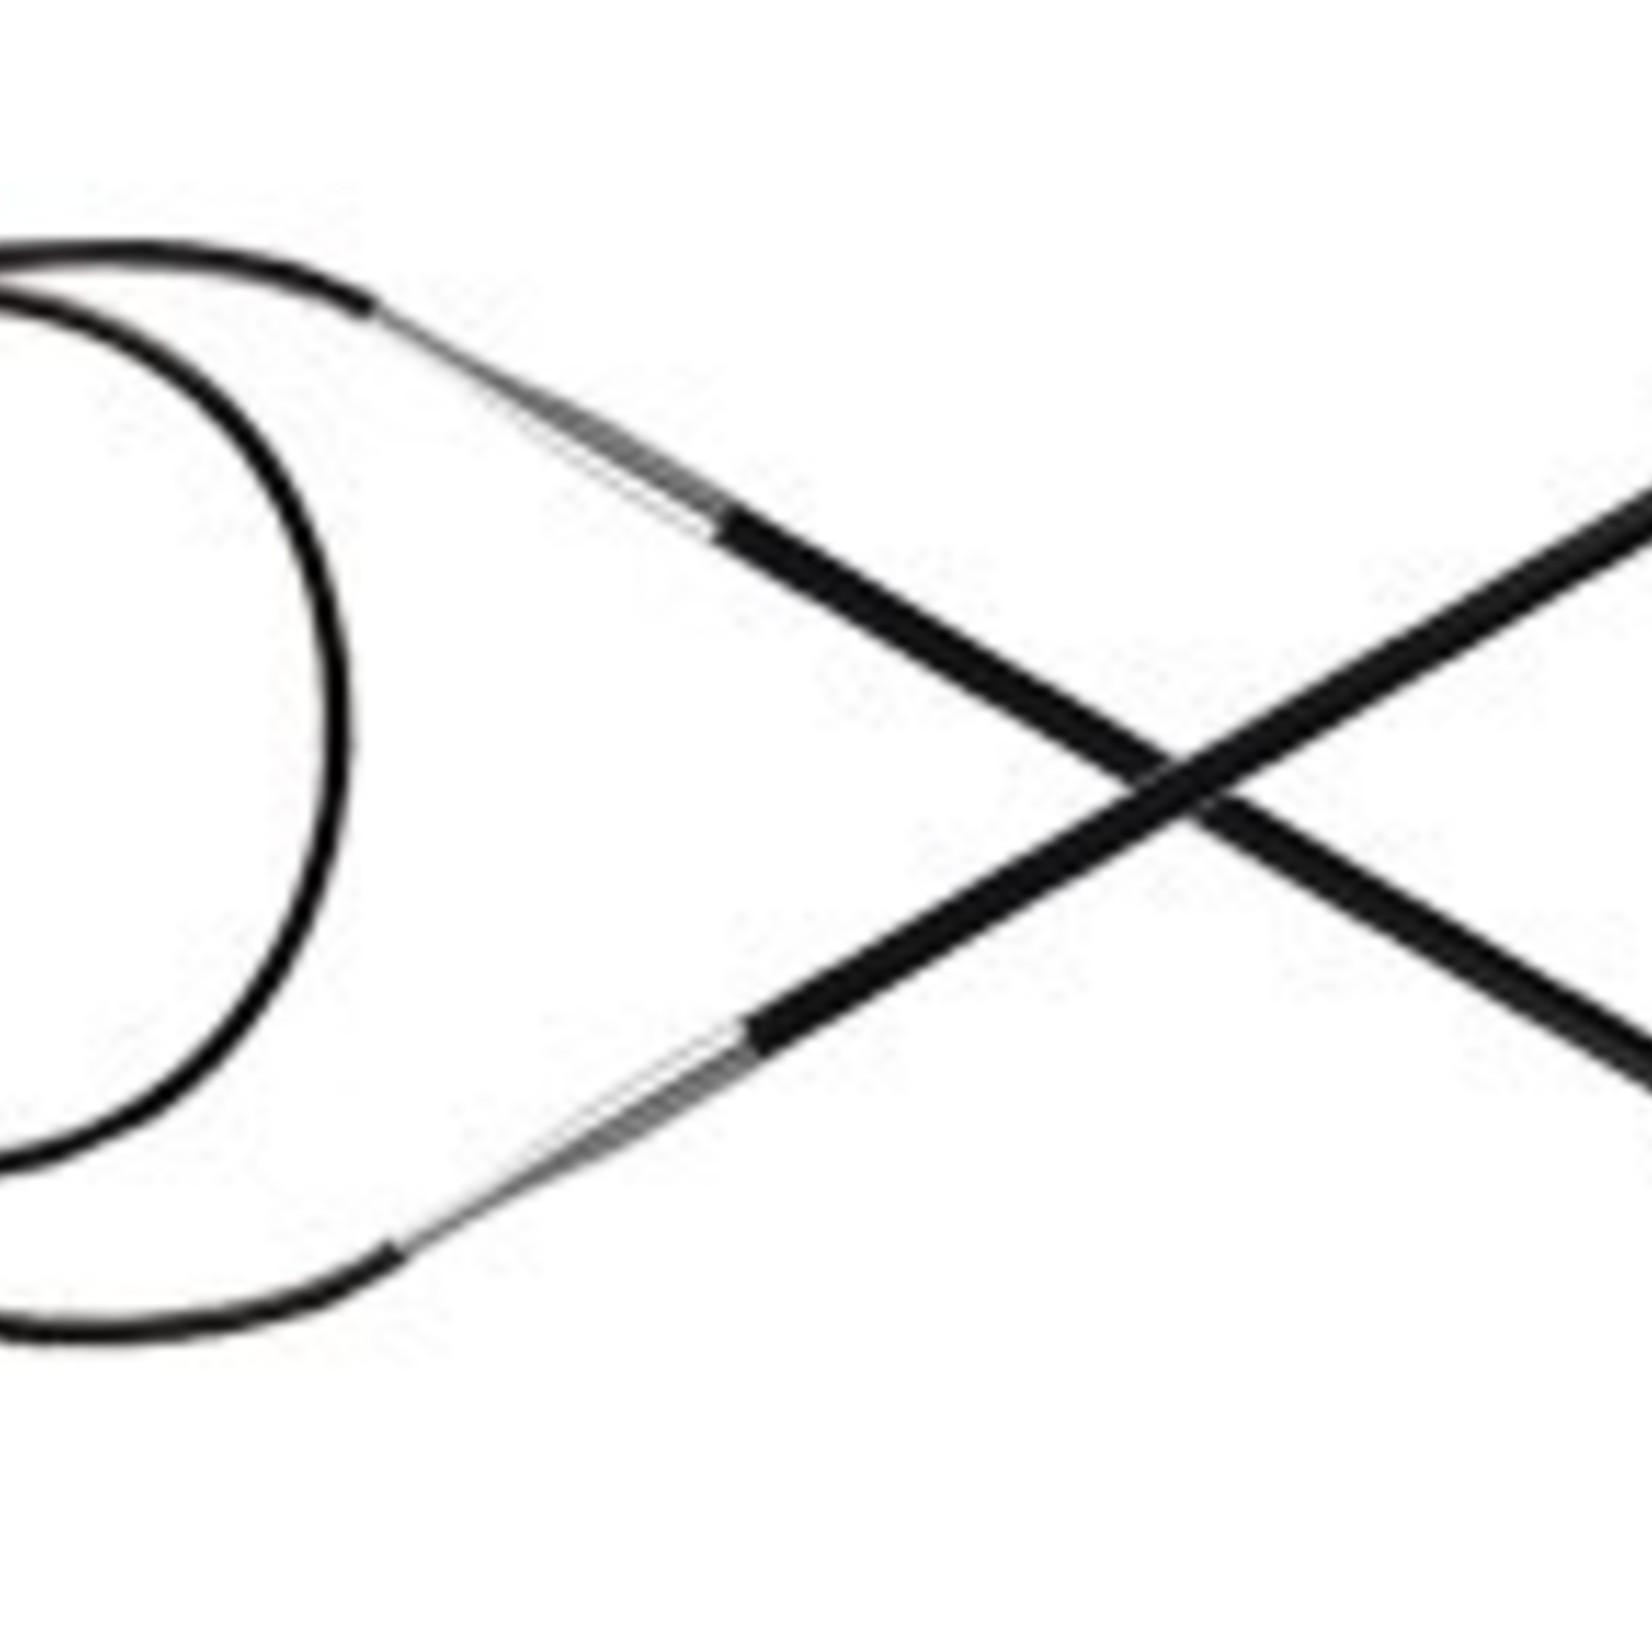 Knitter's Pride 6 Karbonz Circular 40